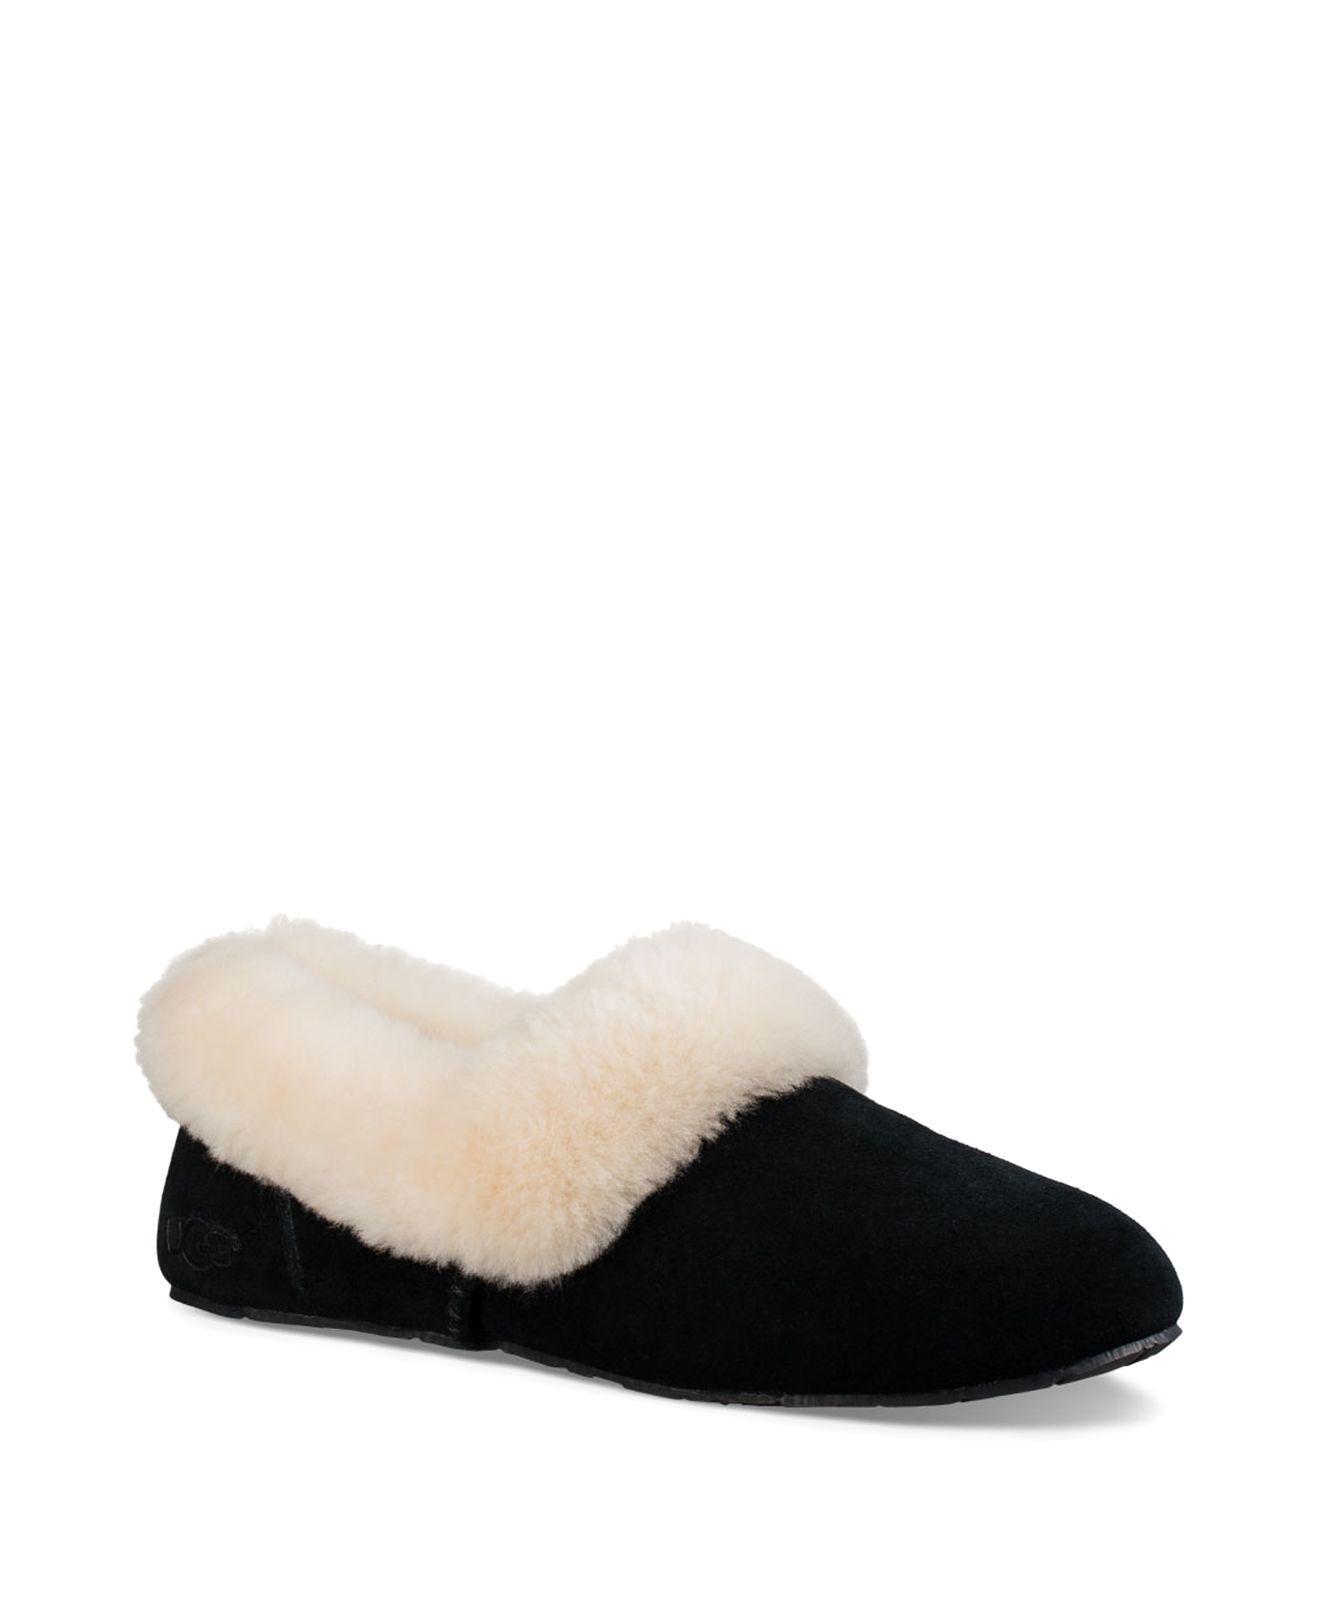 UGG. Women's Black ® Kendyl Suede Sheepskin Collar Slippers